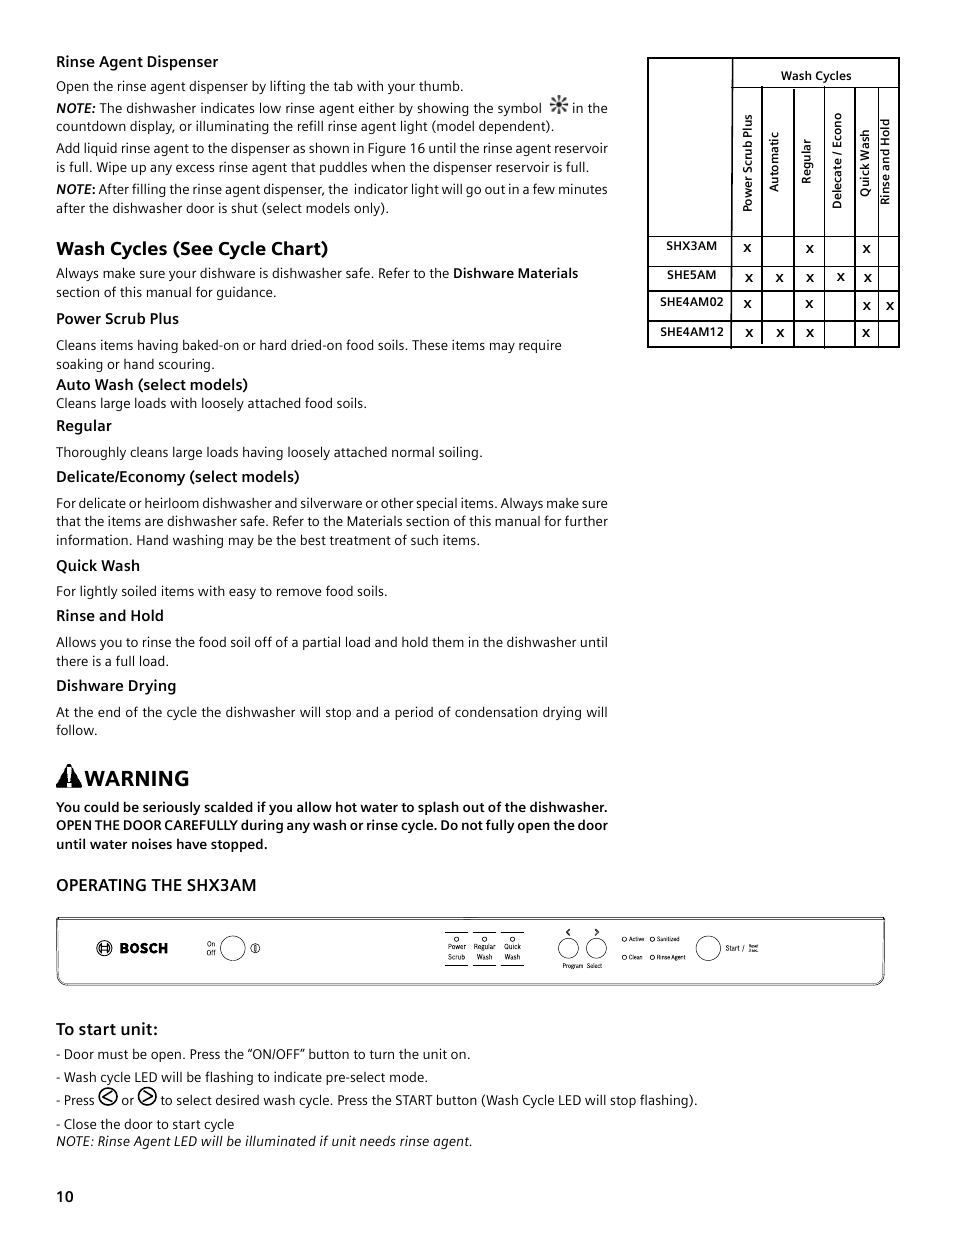 Warning, Wash cycles (see cycle chart) | Bosch SHE4AM User